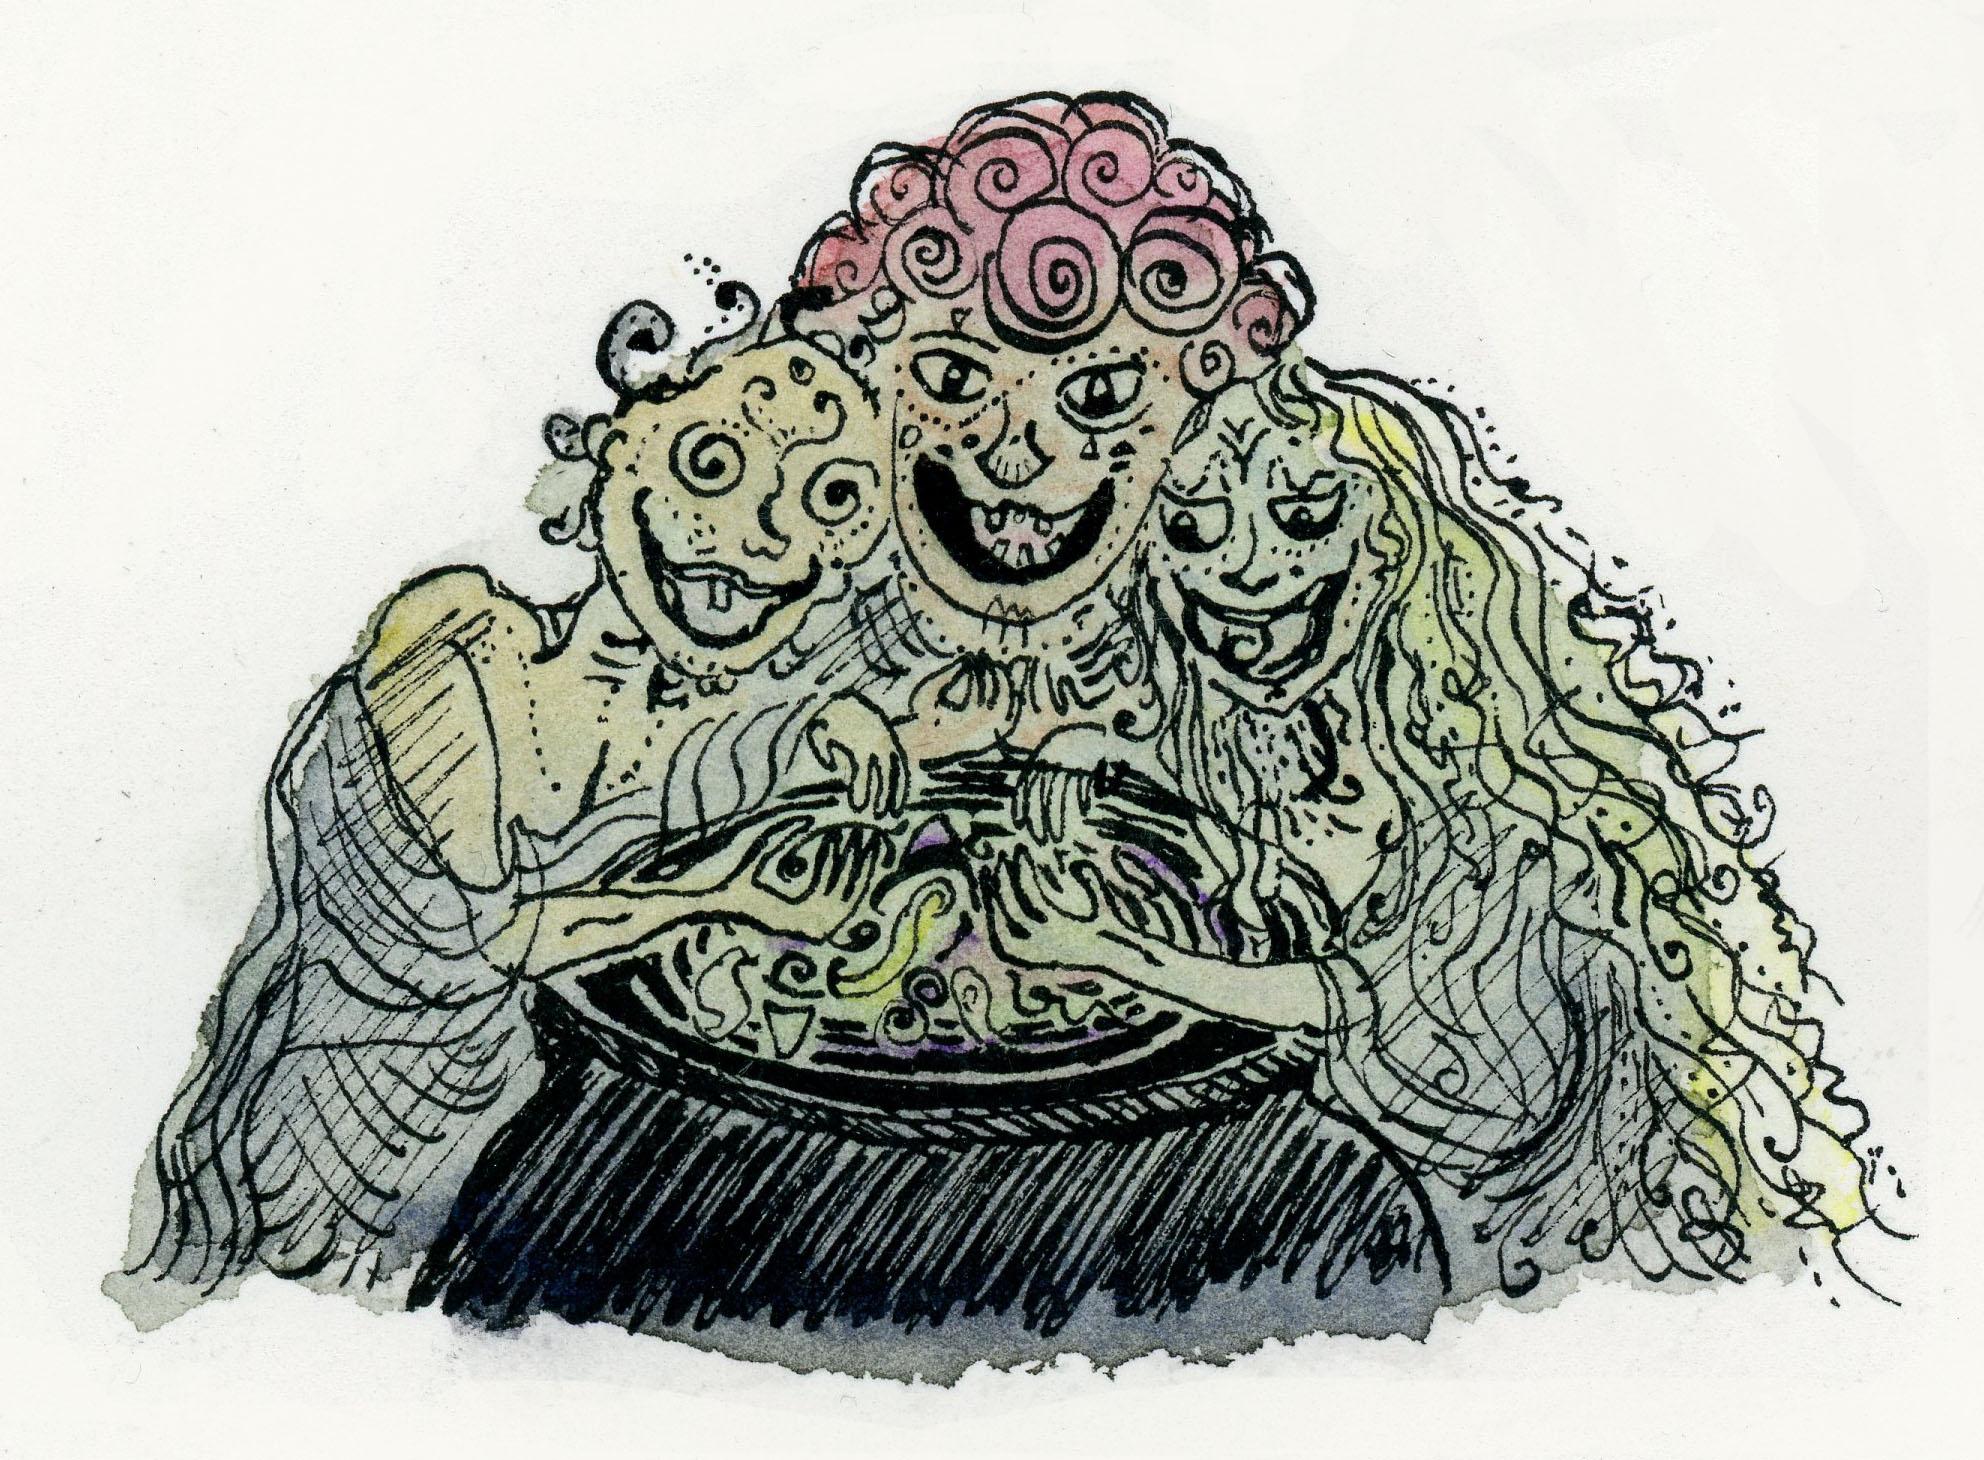 11. Weird sisters